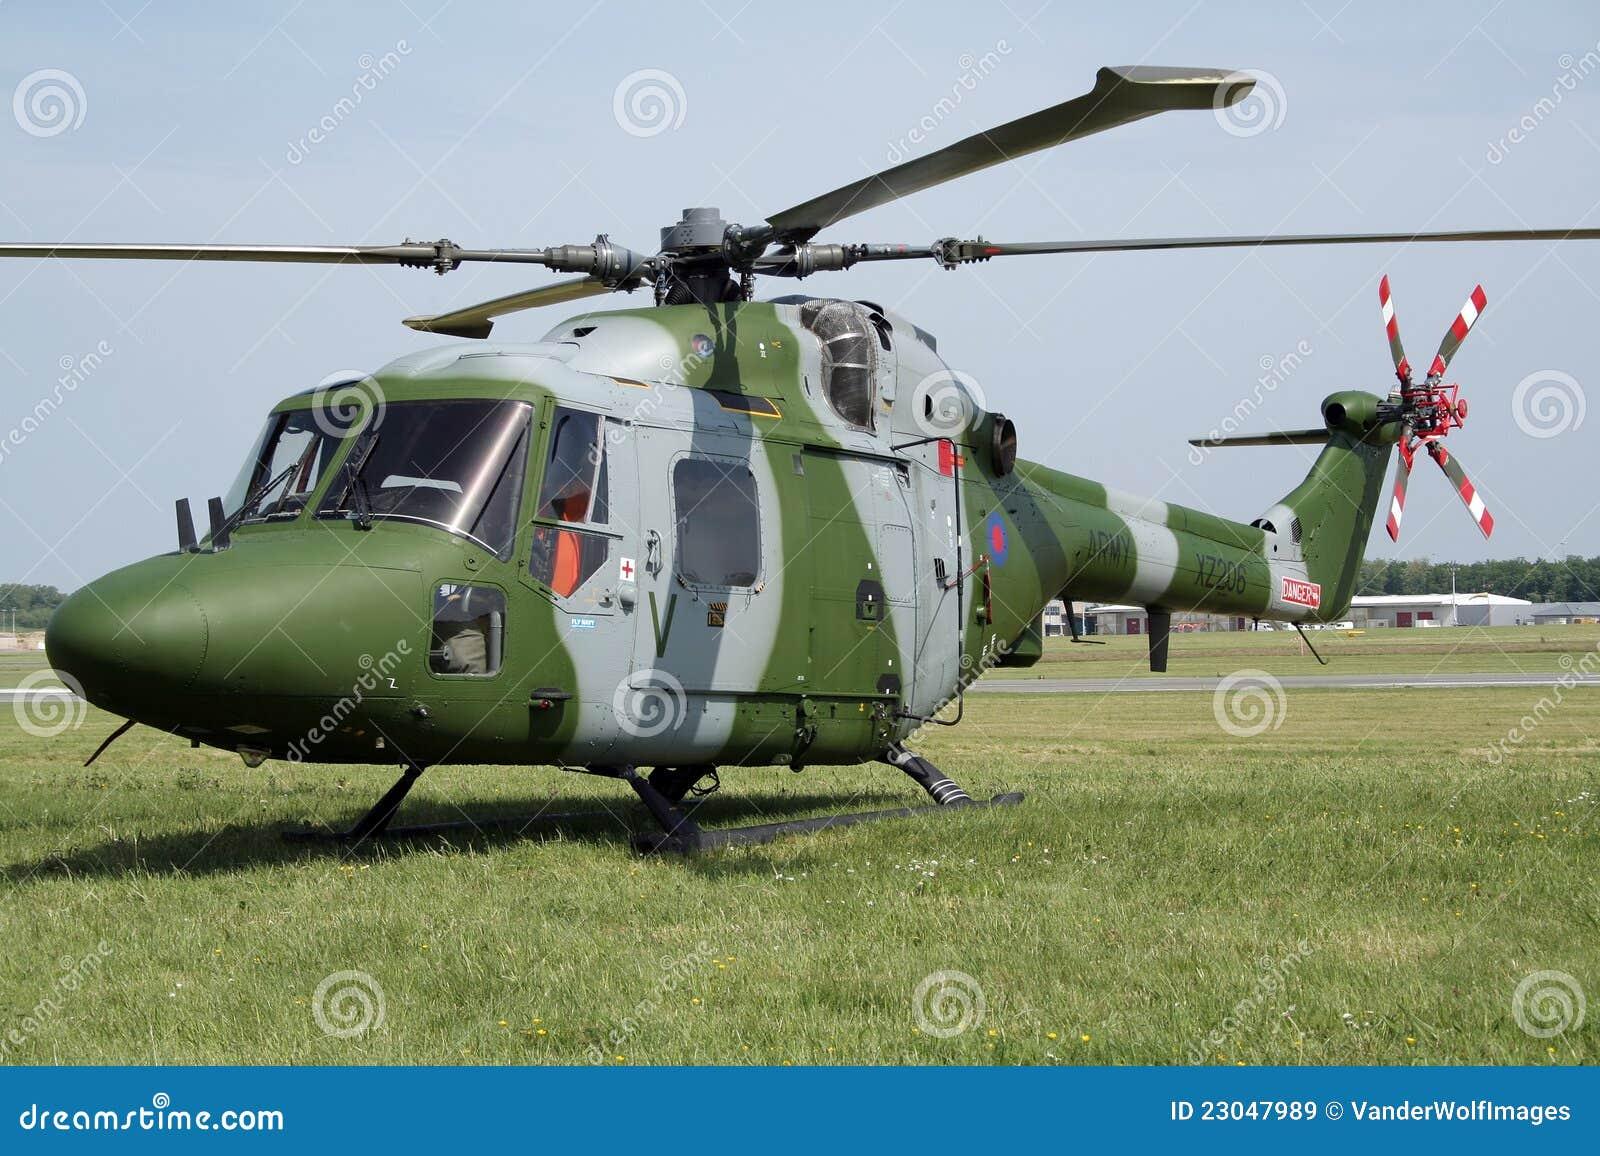 heli 3 download with Royalty Vrije Stock Afbeeldingen De Koninklijke Helikopter Van De Lynx Van Het Leger Image23047989 on Macrobot additionally Balloon together with Royalty Free Stock Photography Tail Rotors  bat Helicopter Image15935087 as well Claas Lexion 580 600 together with 1510061j.